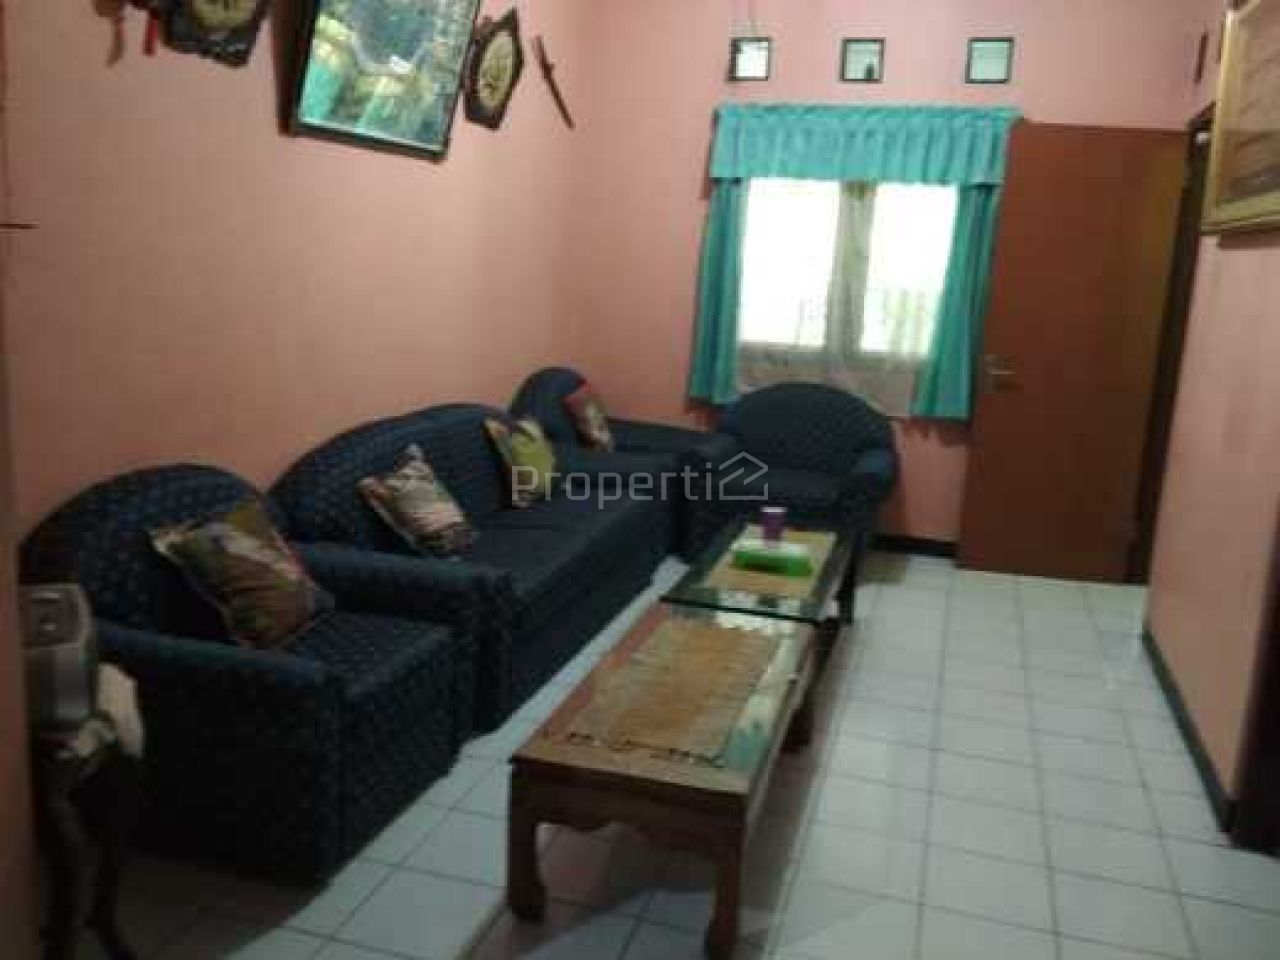 Rumah dengan Lingkungan Asri, Sejuk, Aman dan Nyaman, Jawa Barat